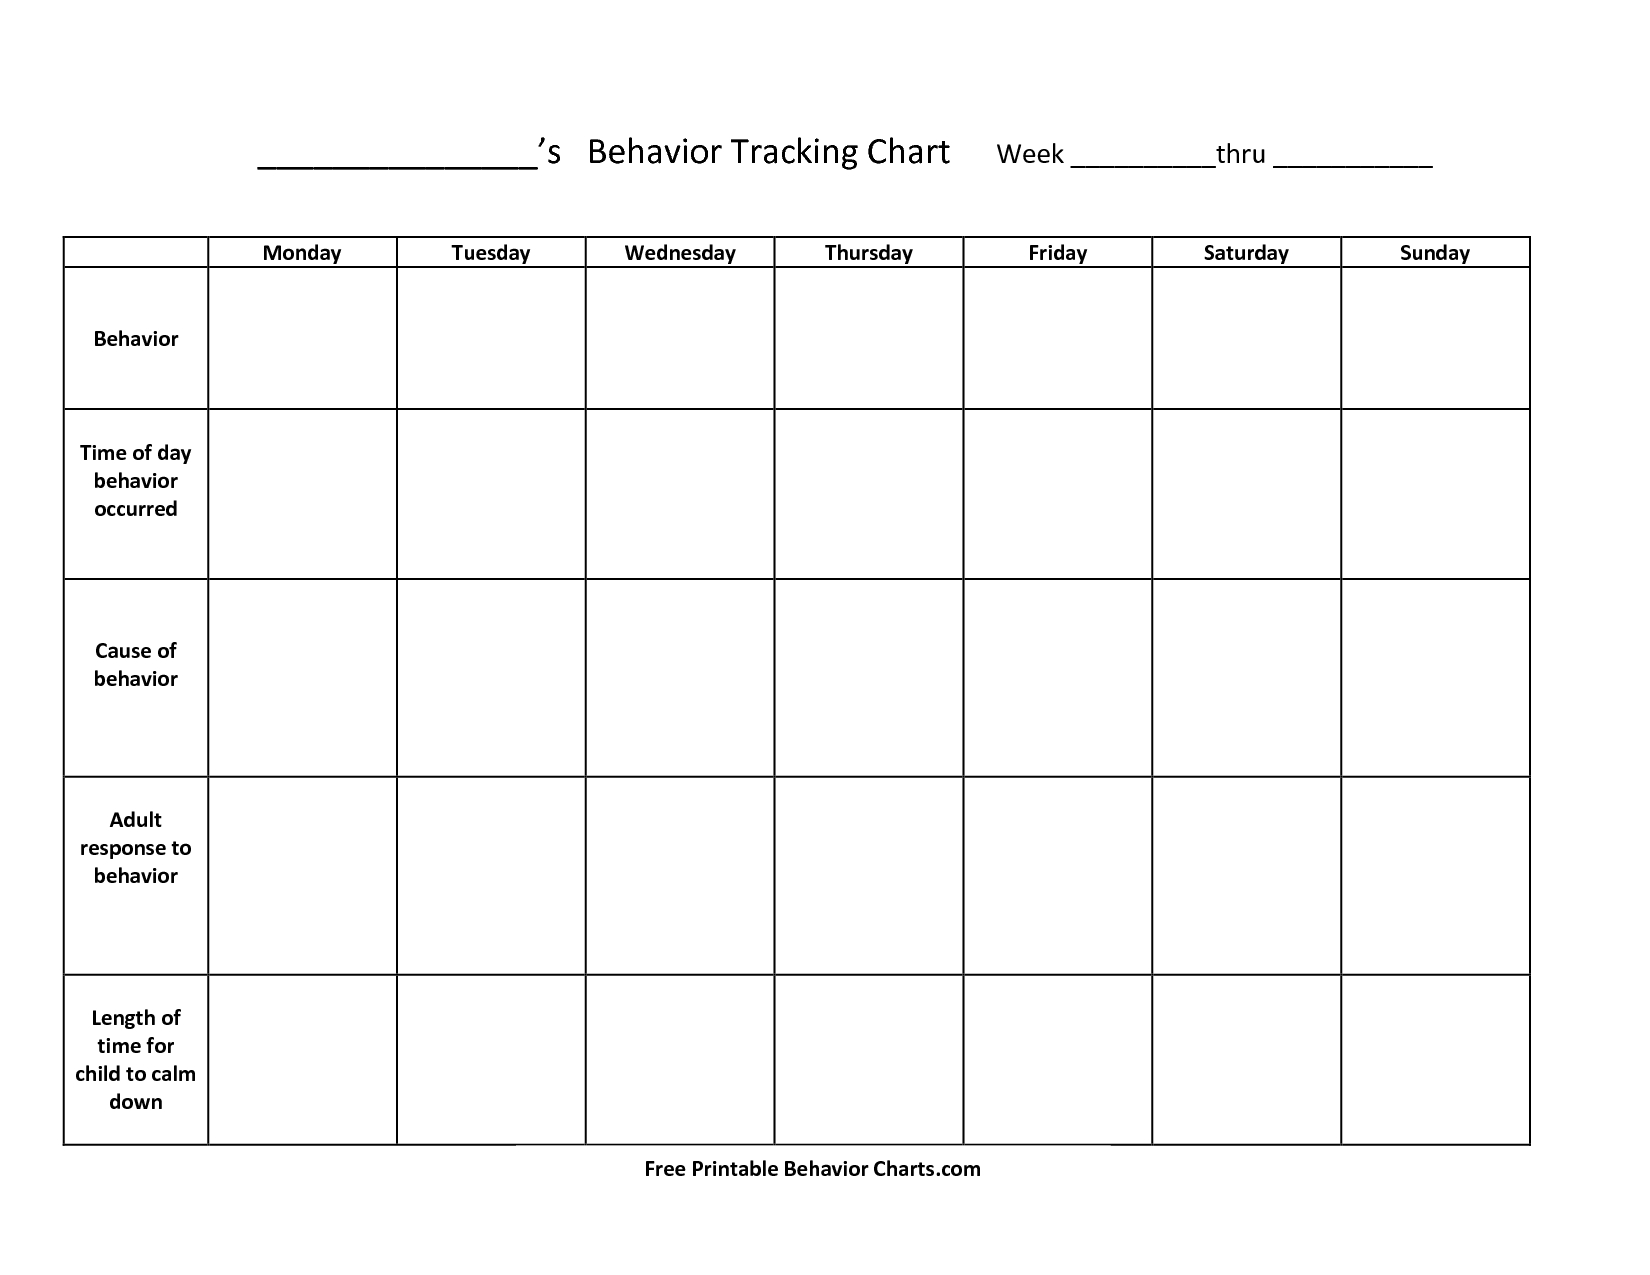 Free+Printable+Behavior+Charts+For+Teachers | Things To Try | Free - Free Printable Charts For Classroom